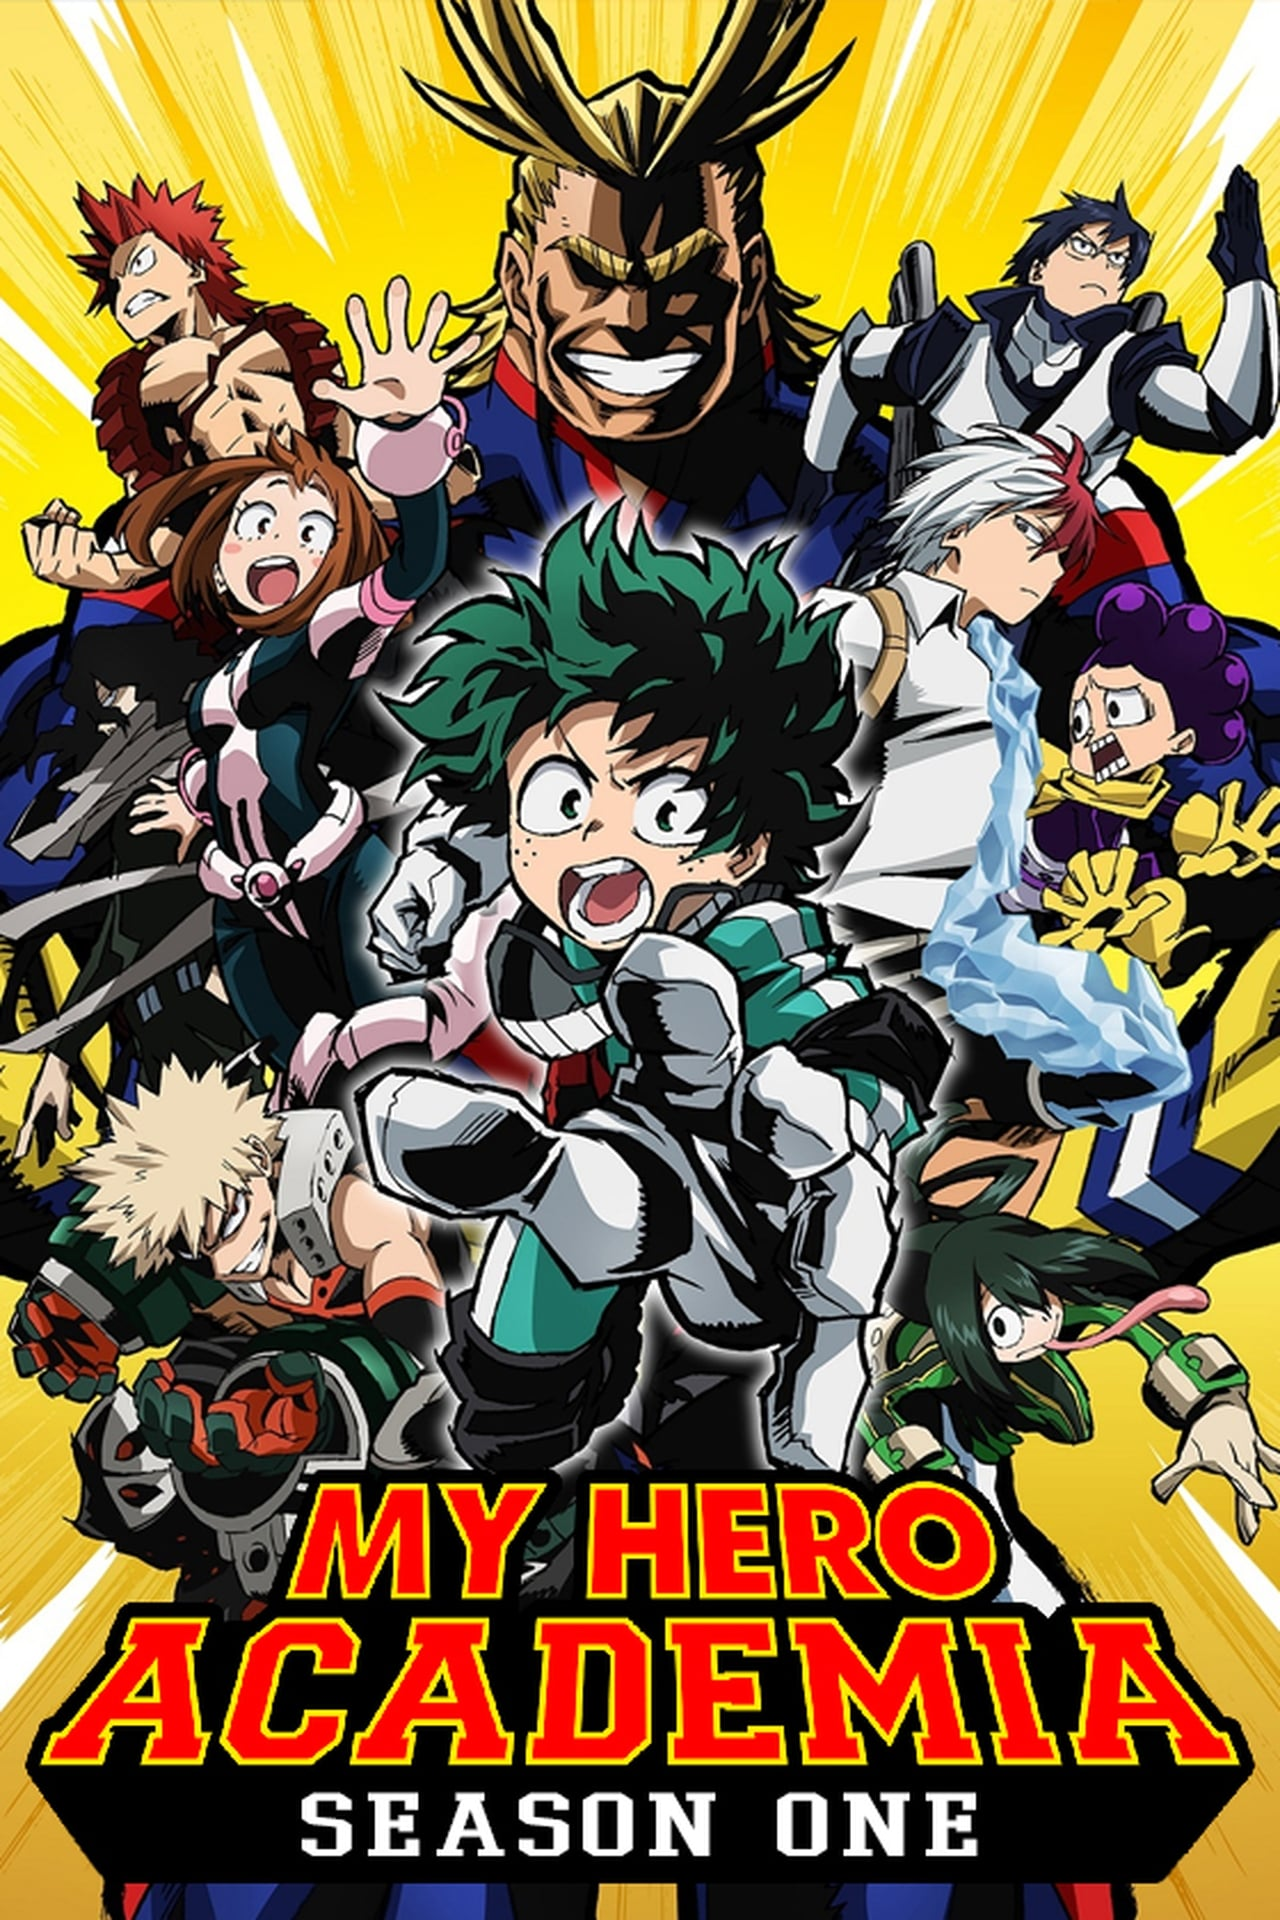 My Hero Academia (2016)